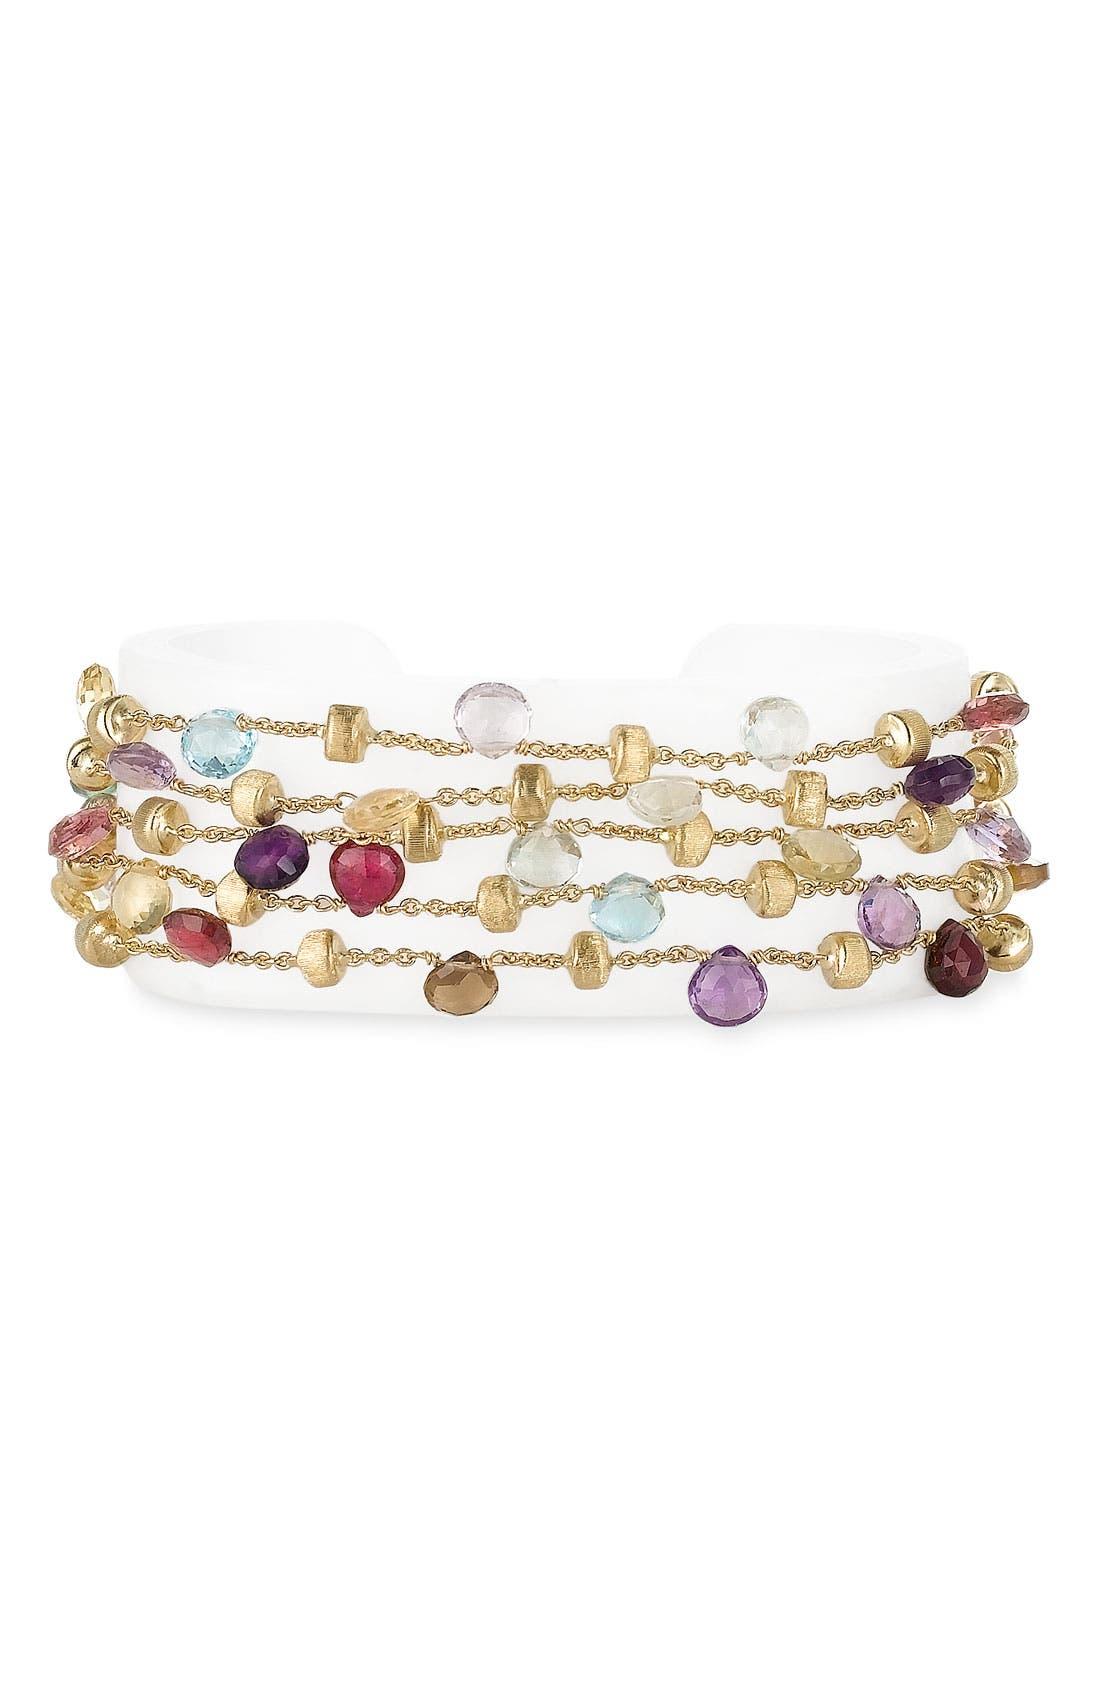 Alternate Image 1 Selected - Marco Bicego 'Paradise' Five Strand Bracelet